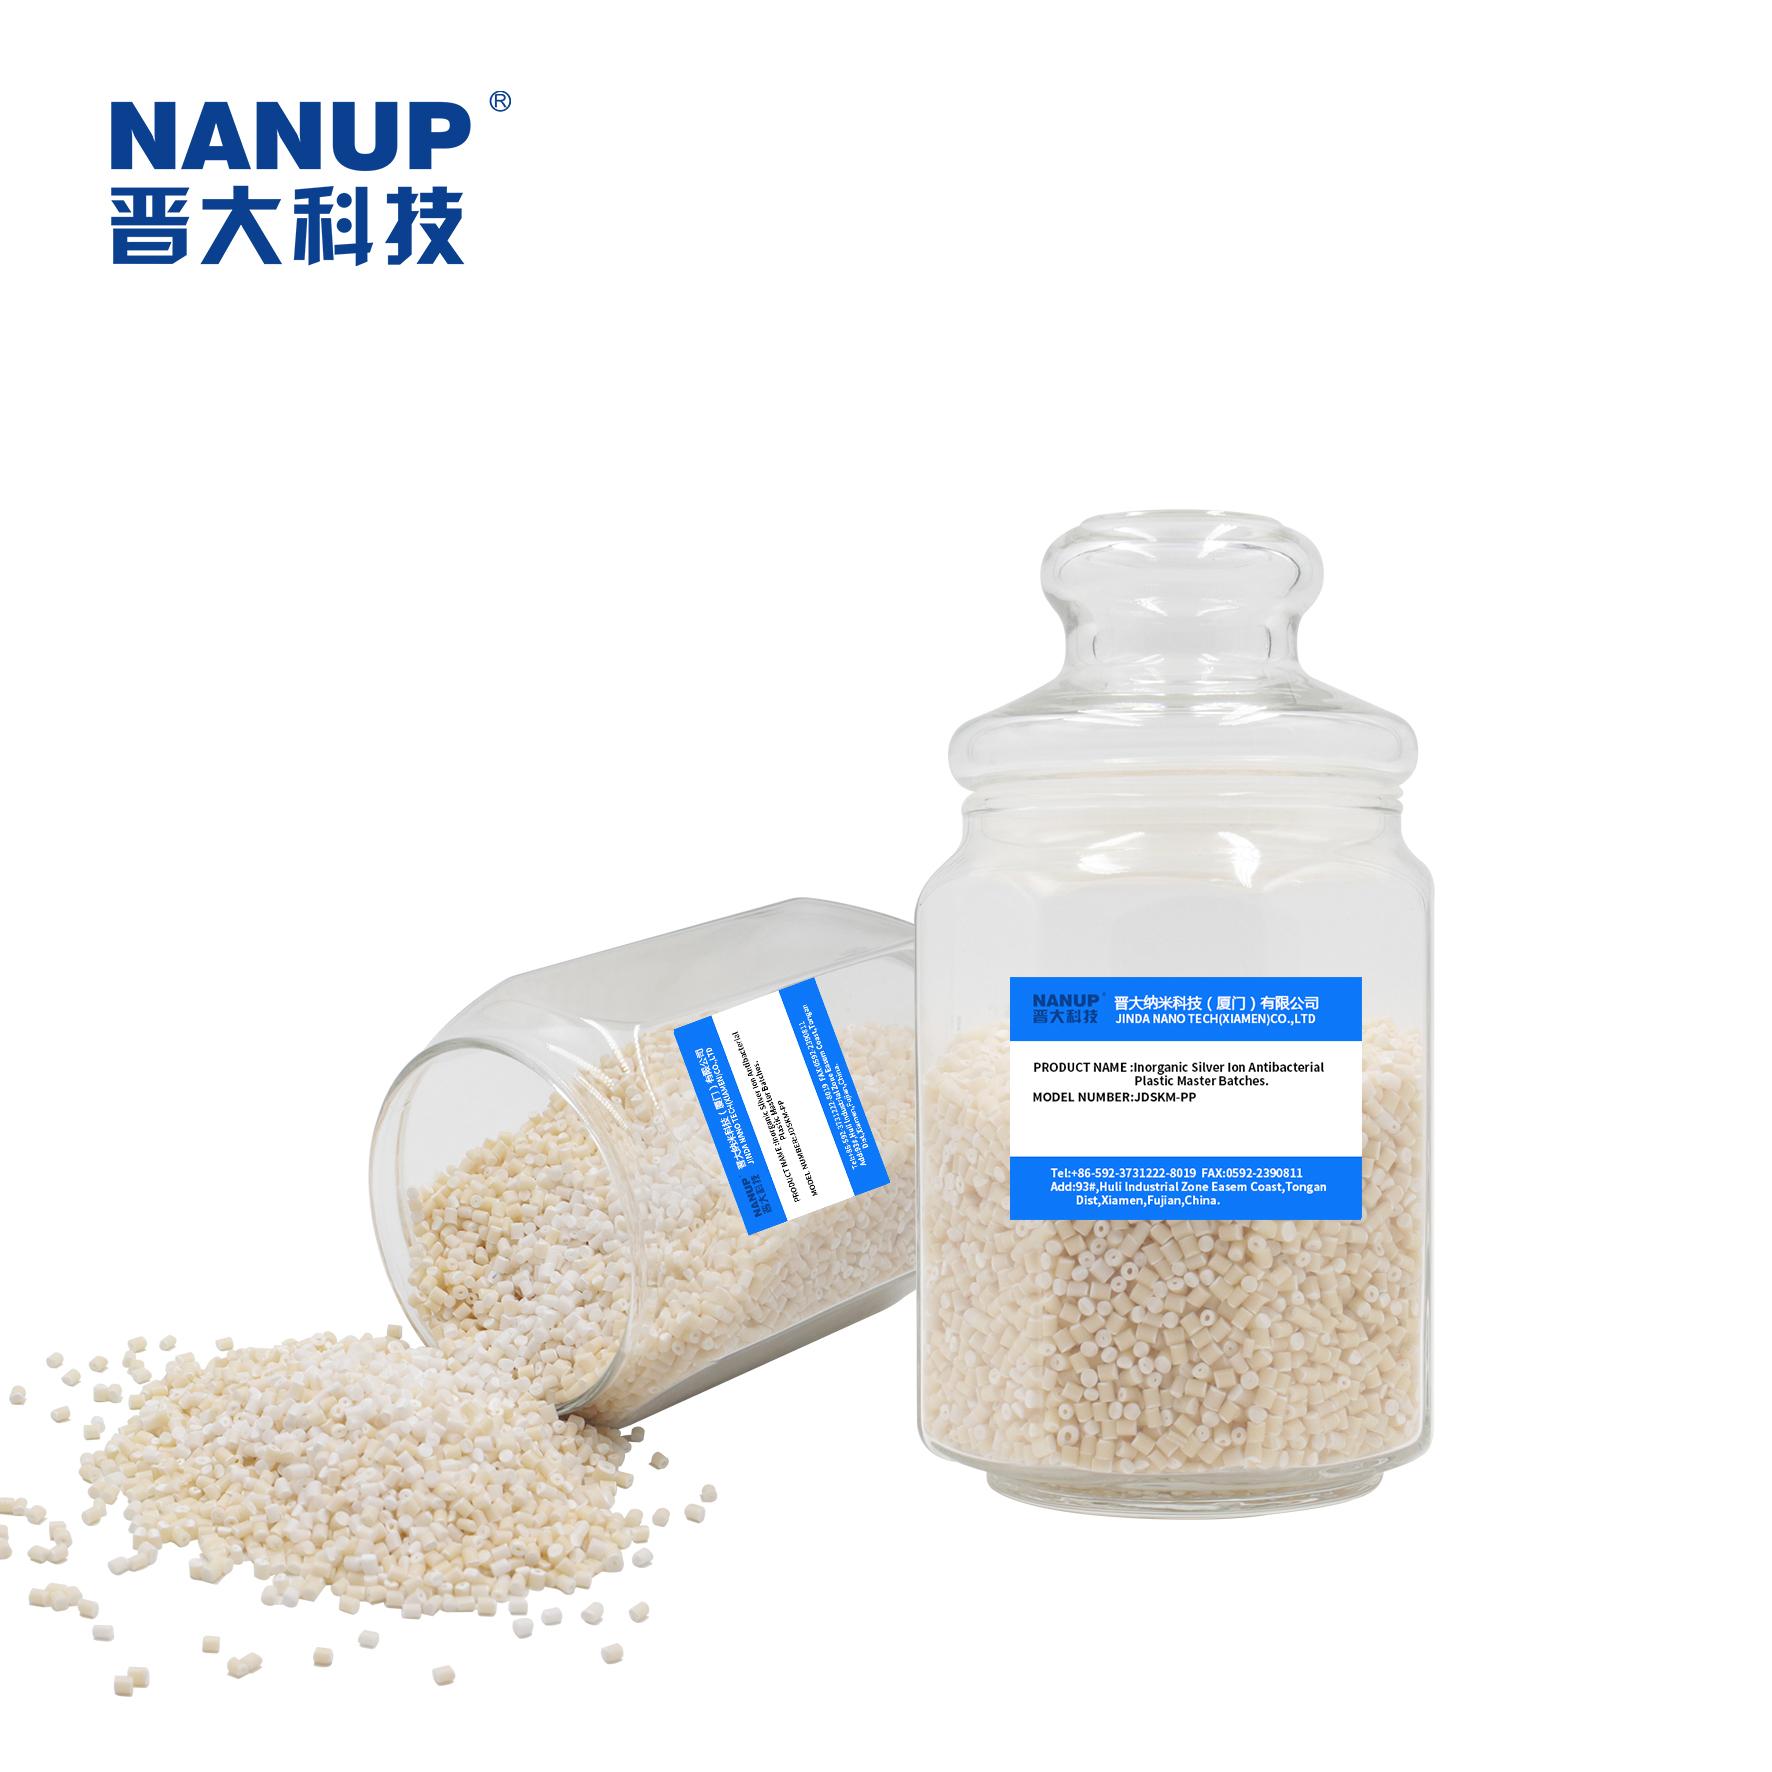 China Powder Masterbatch, China Powder Masterbatch Manufacturers and